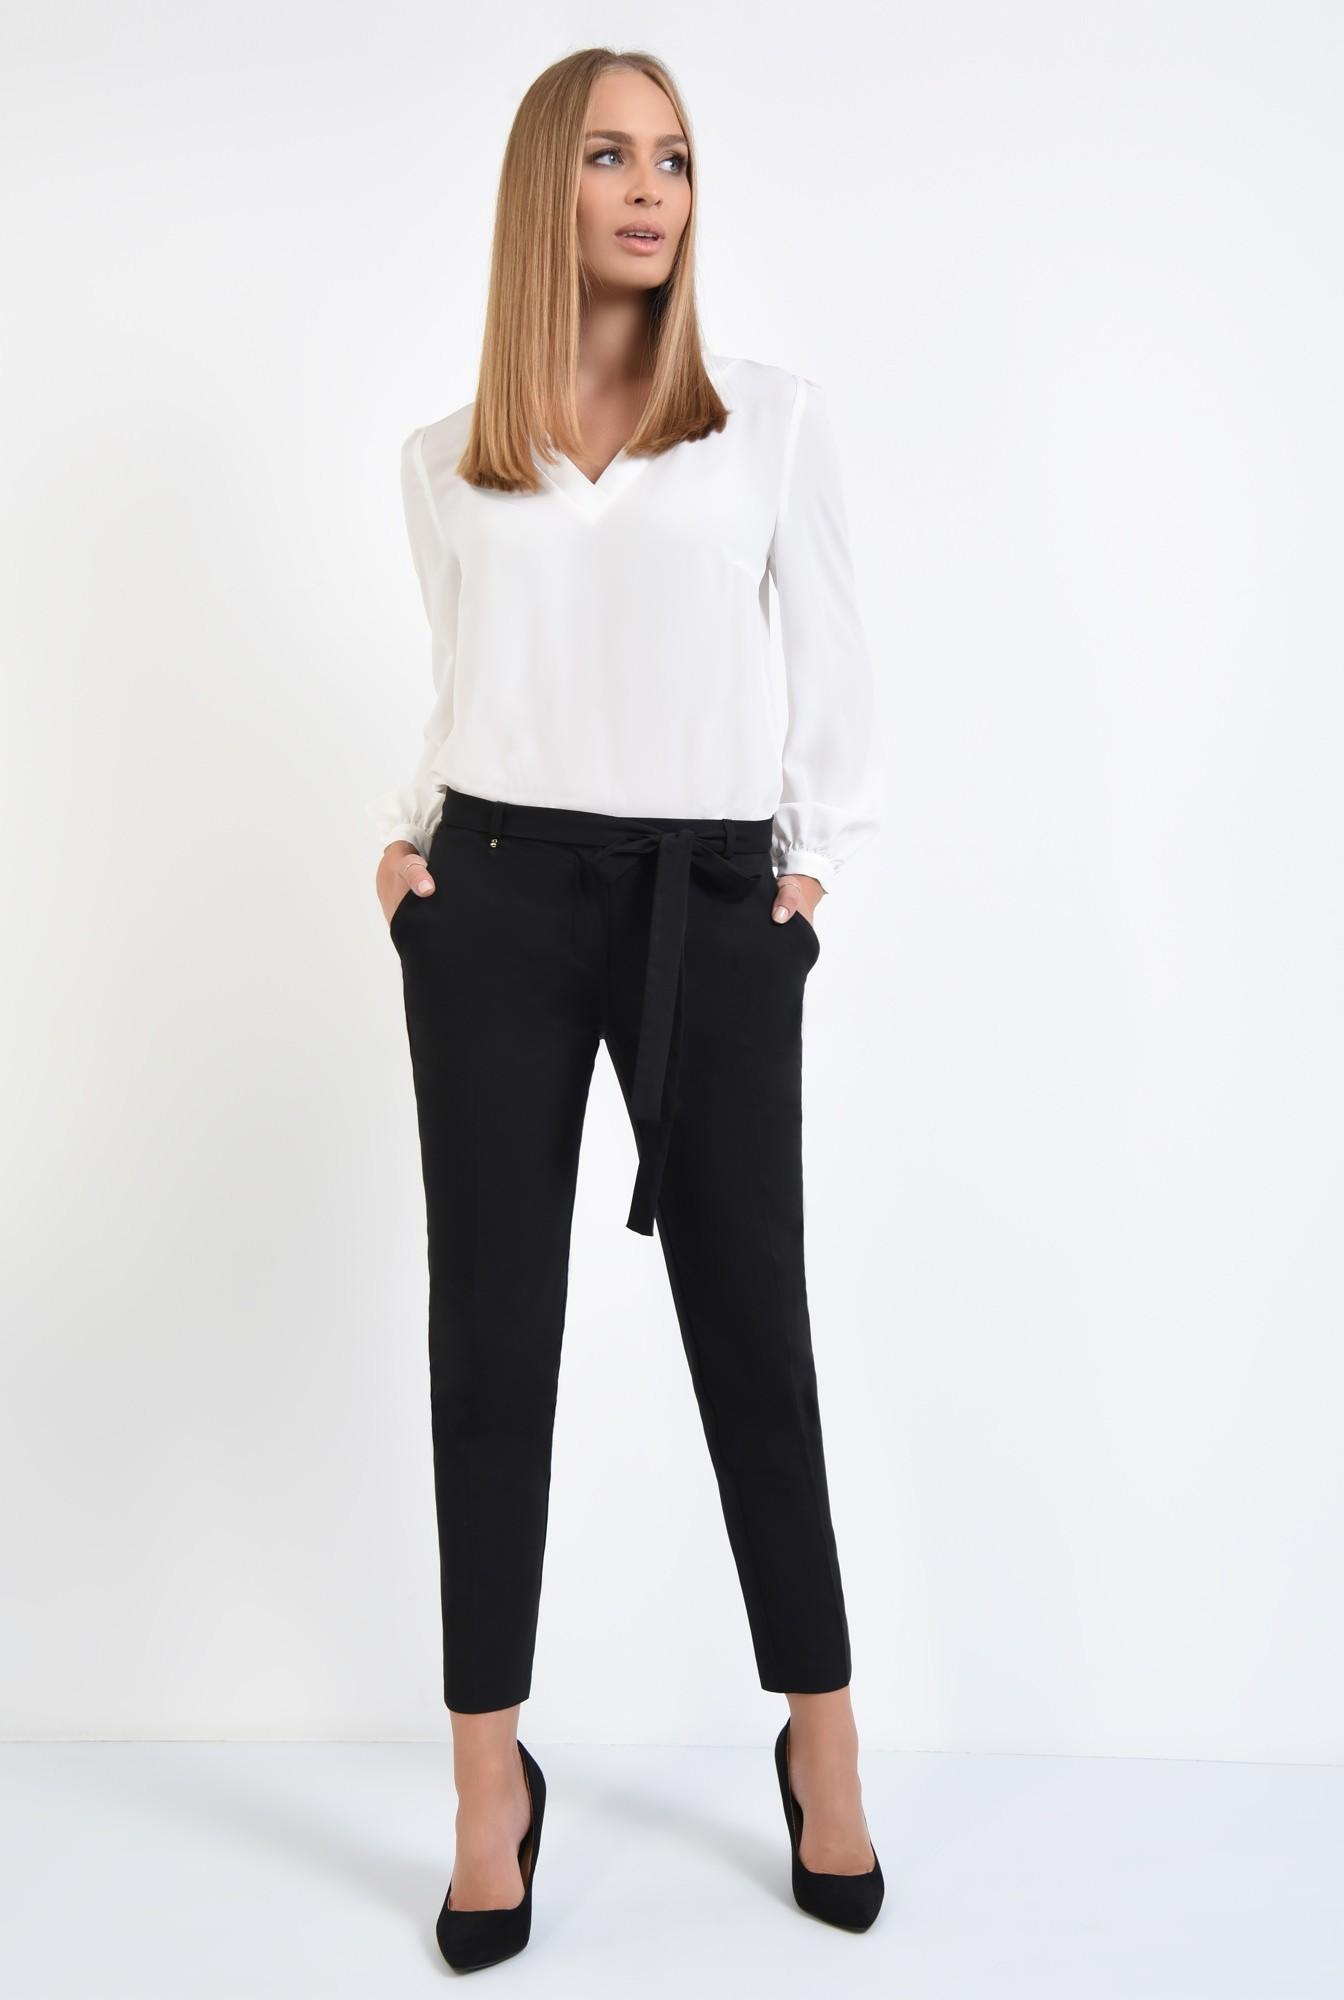 3 - pantaloni casual, negru, buzunare, cordon